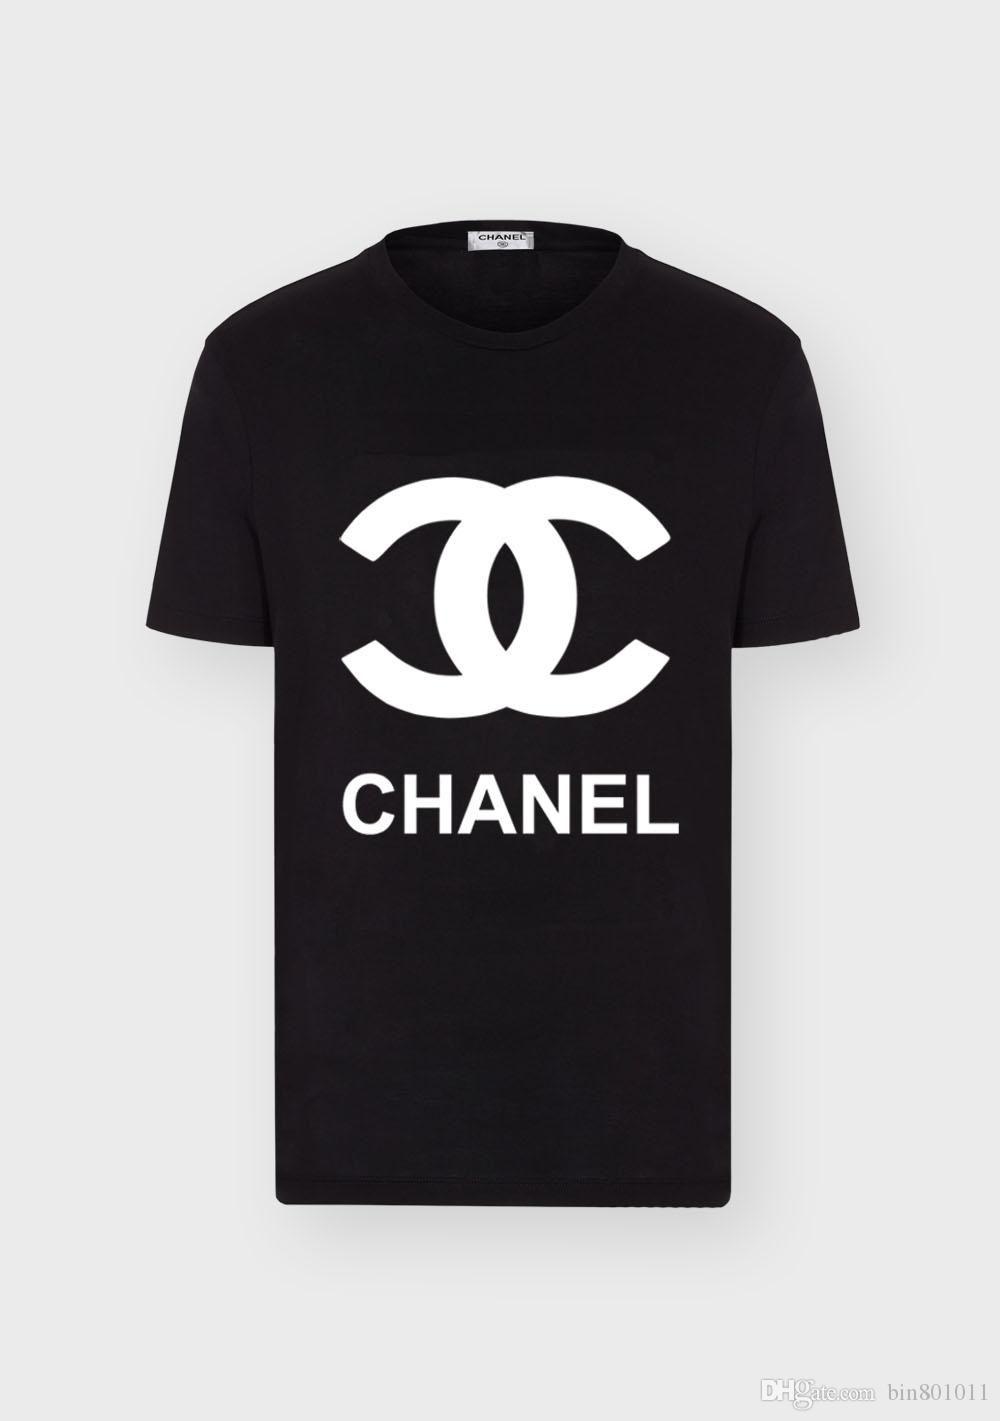 2020ss t-shirt spring and summer new high grade cotton printing short sleeve round neck panel T-Shirt Size: m-xxxxl- women skull M30